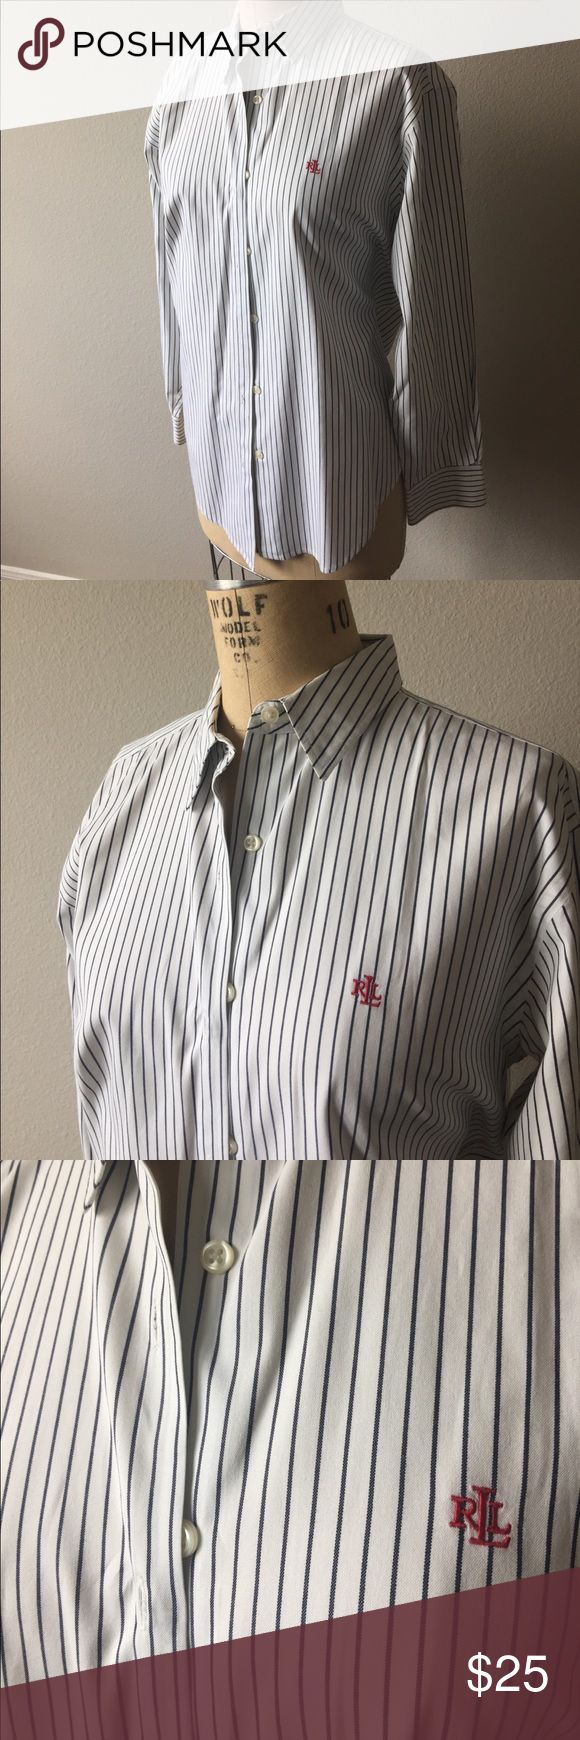 e7dfafa90868 lauren by ralph lauren dresses bloomingdales ralph lauren black label shirt